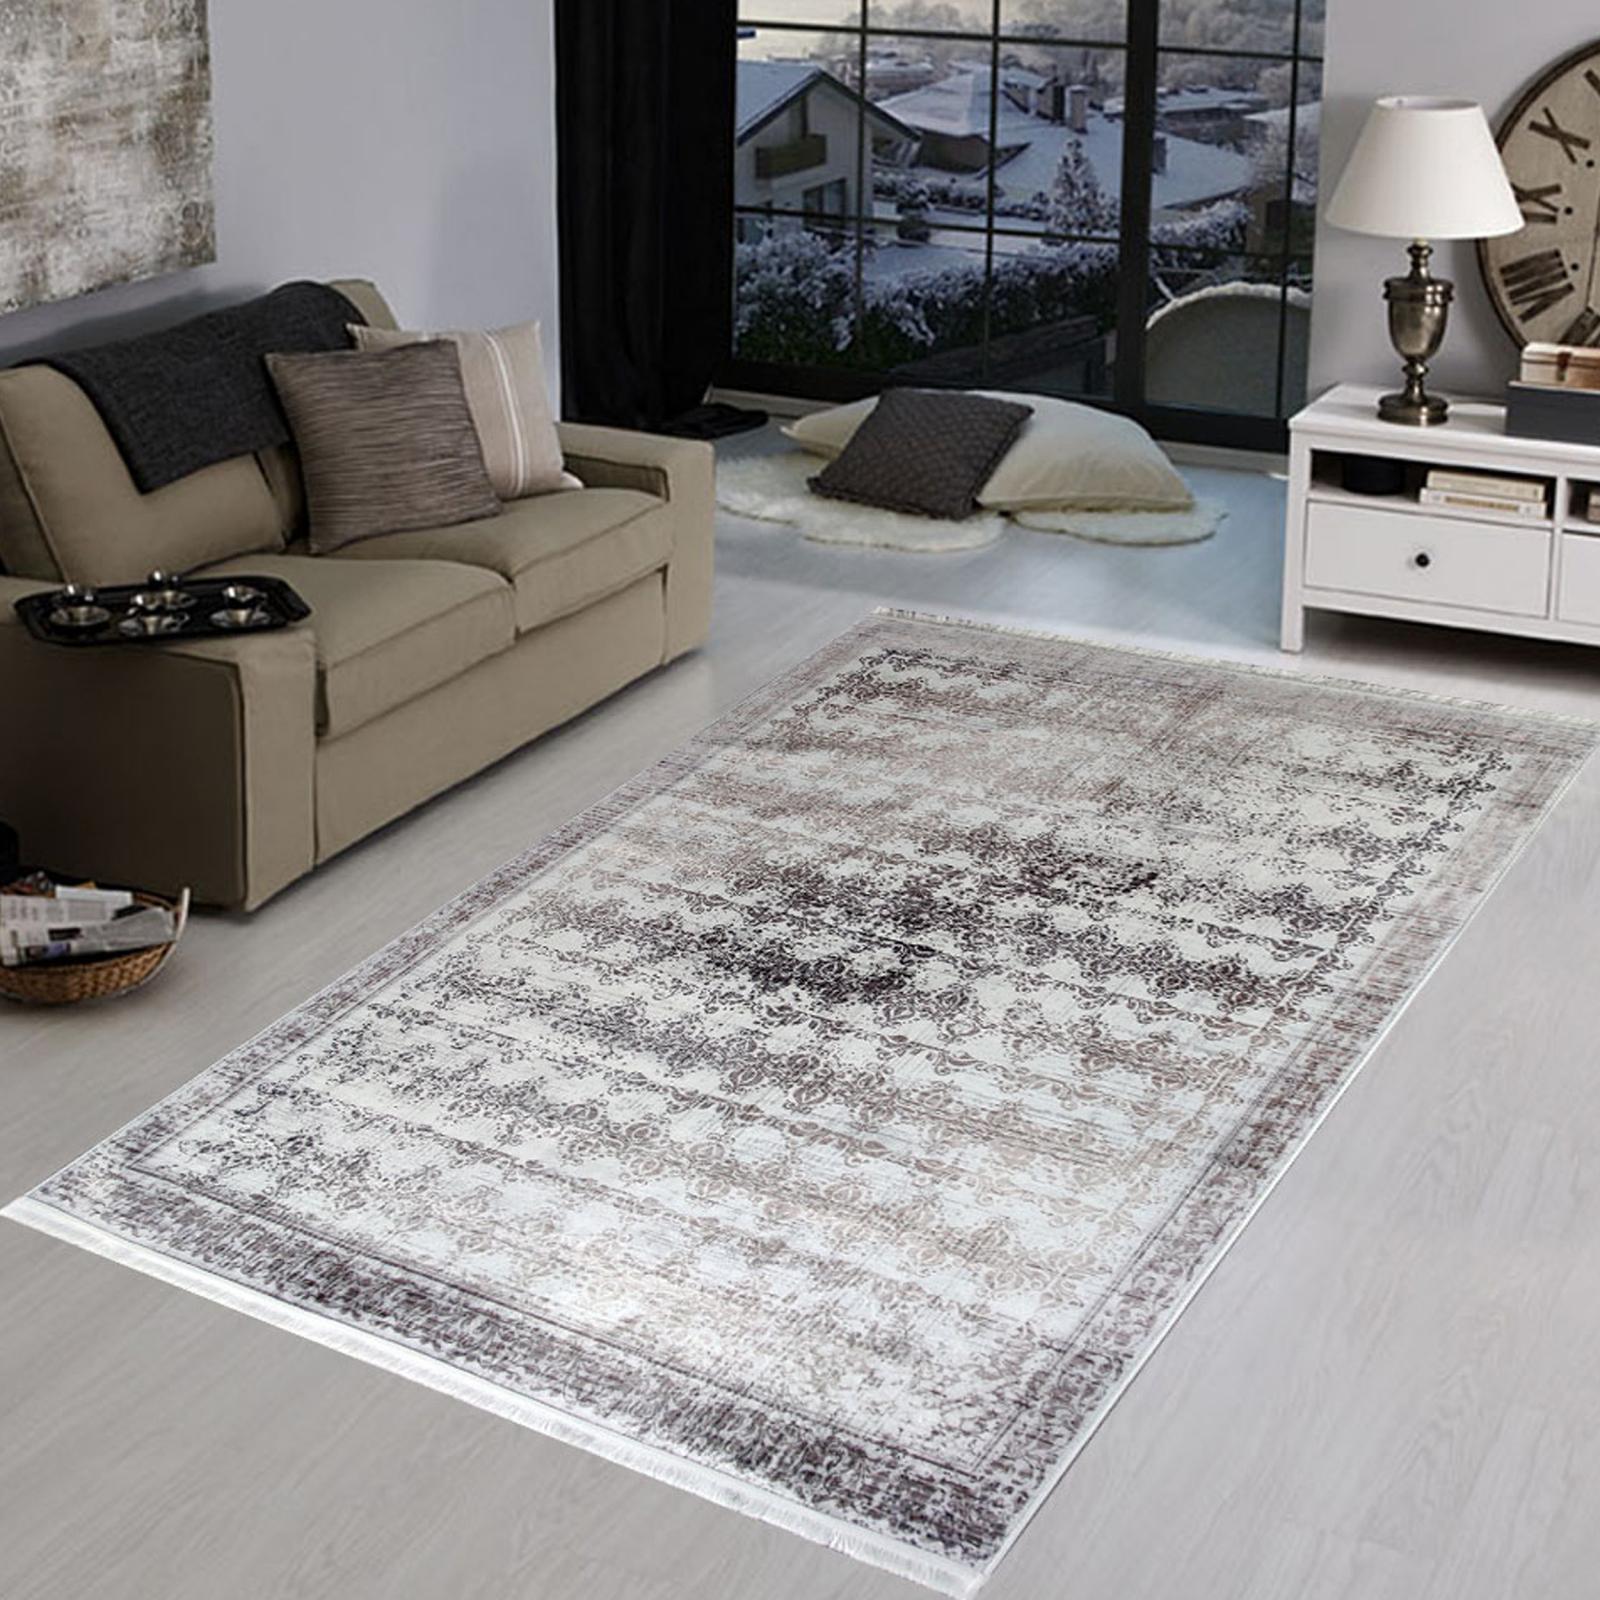 Karaca Home Modern Alisa Gri Halı 160x230cm